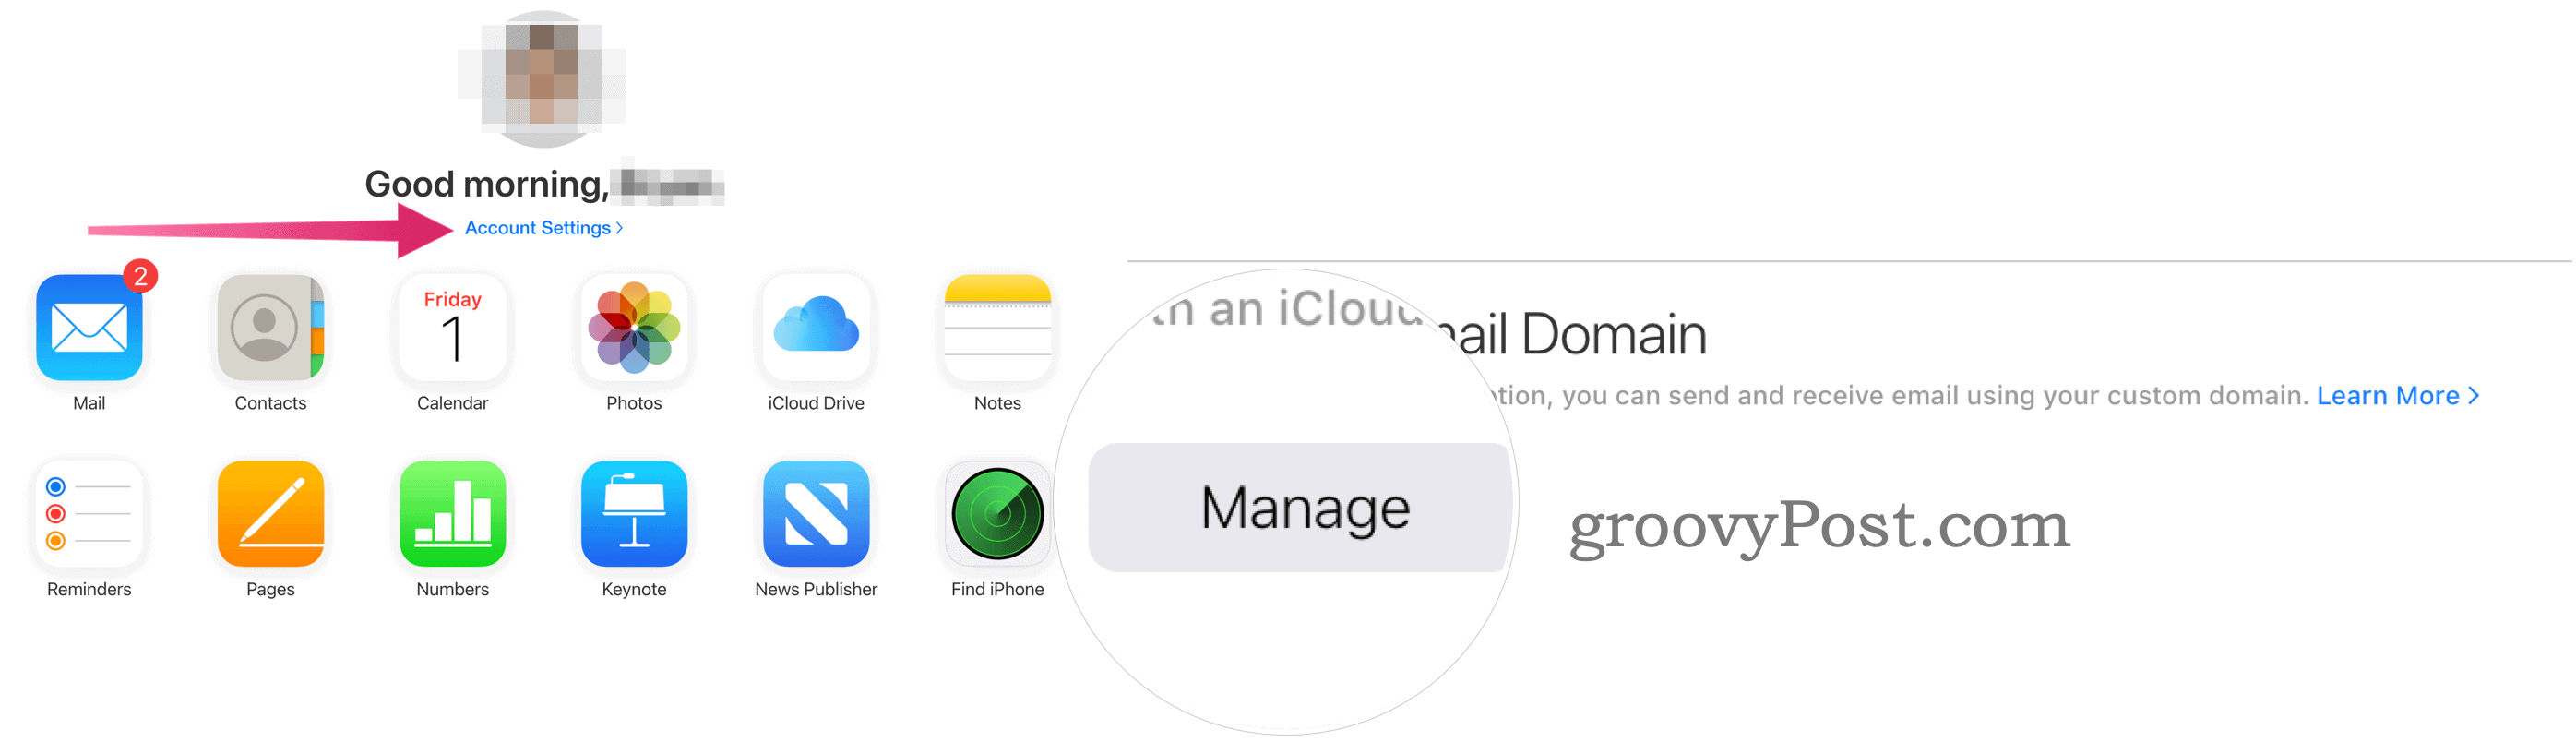 Manage custom email domain